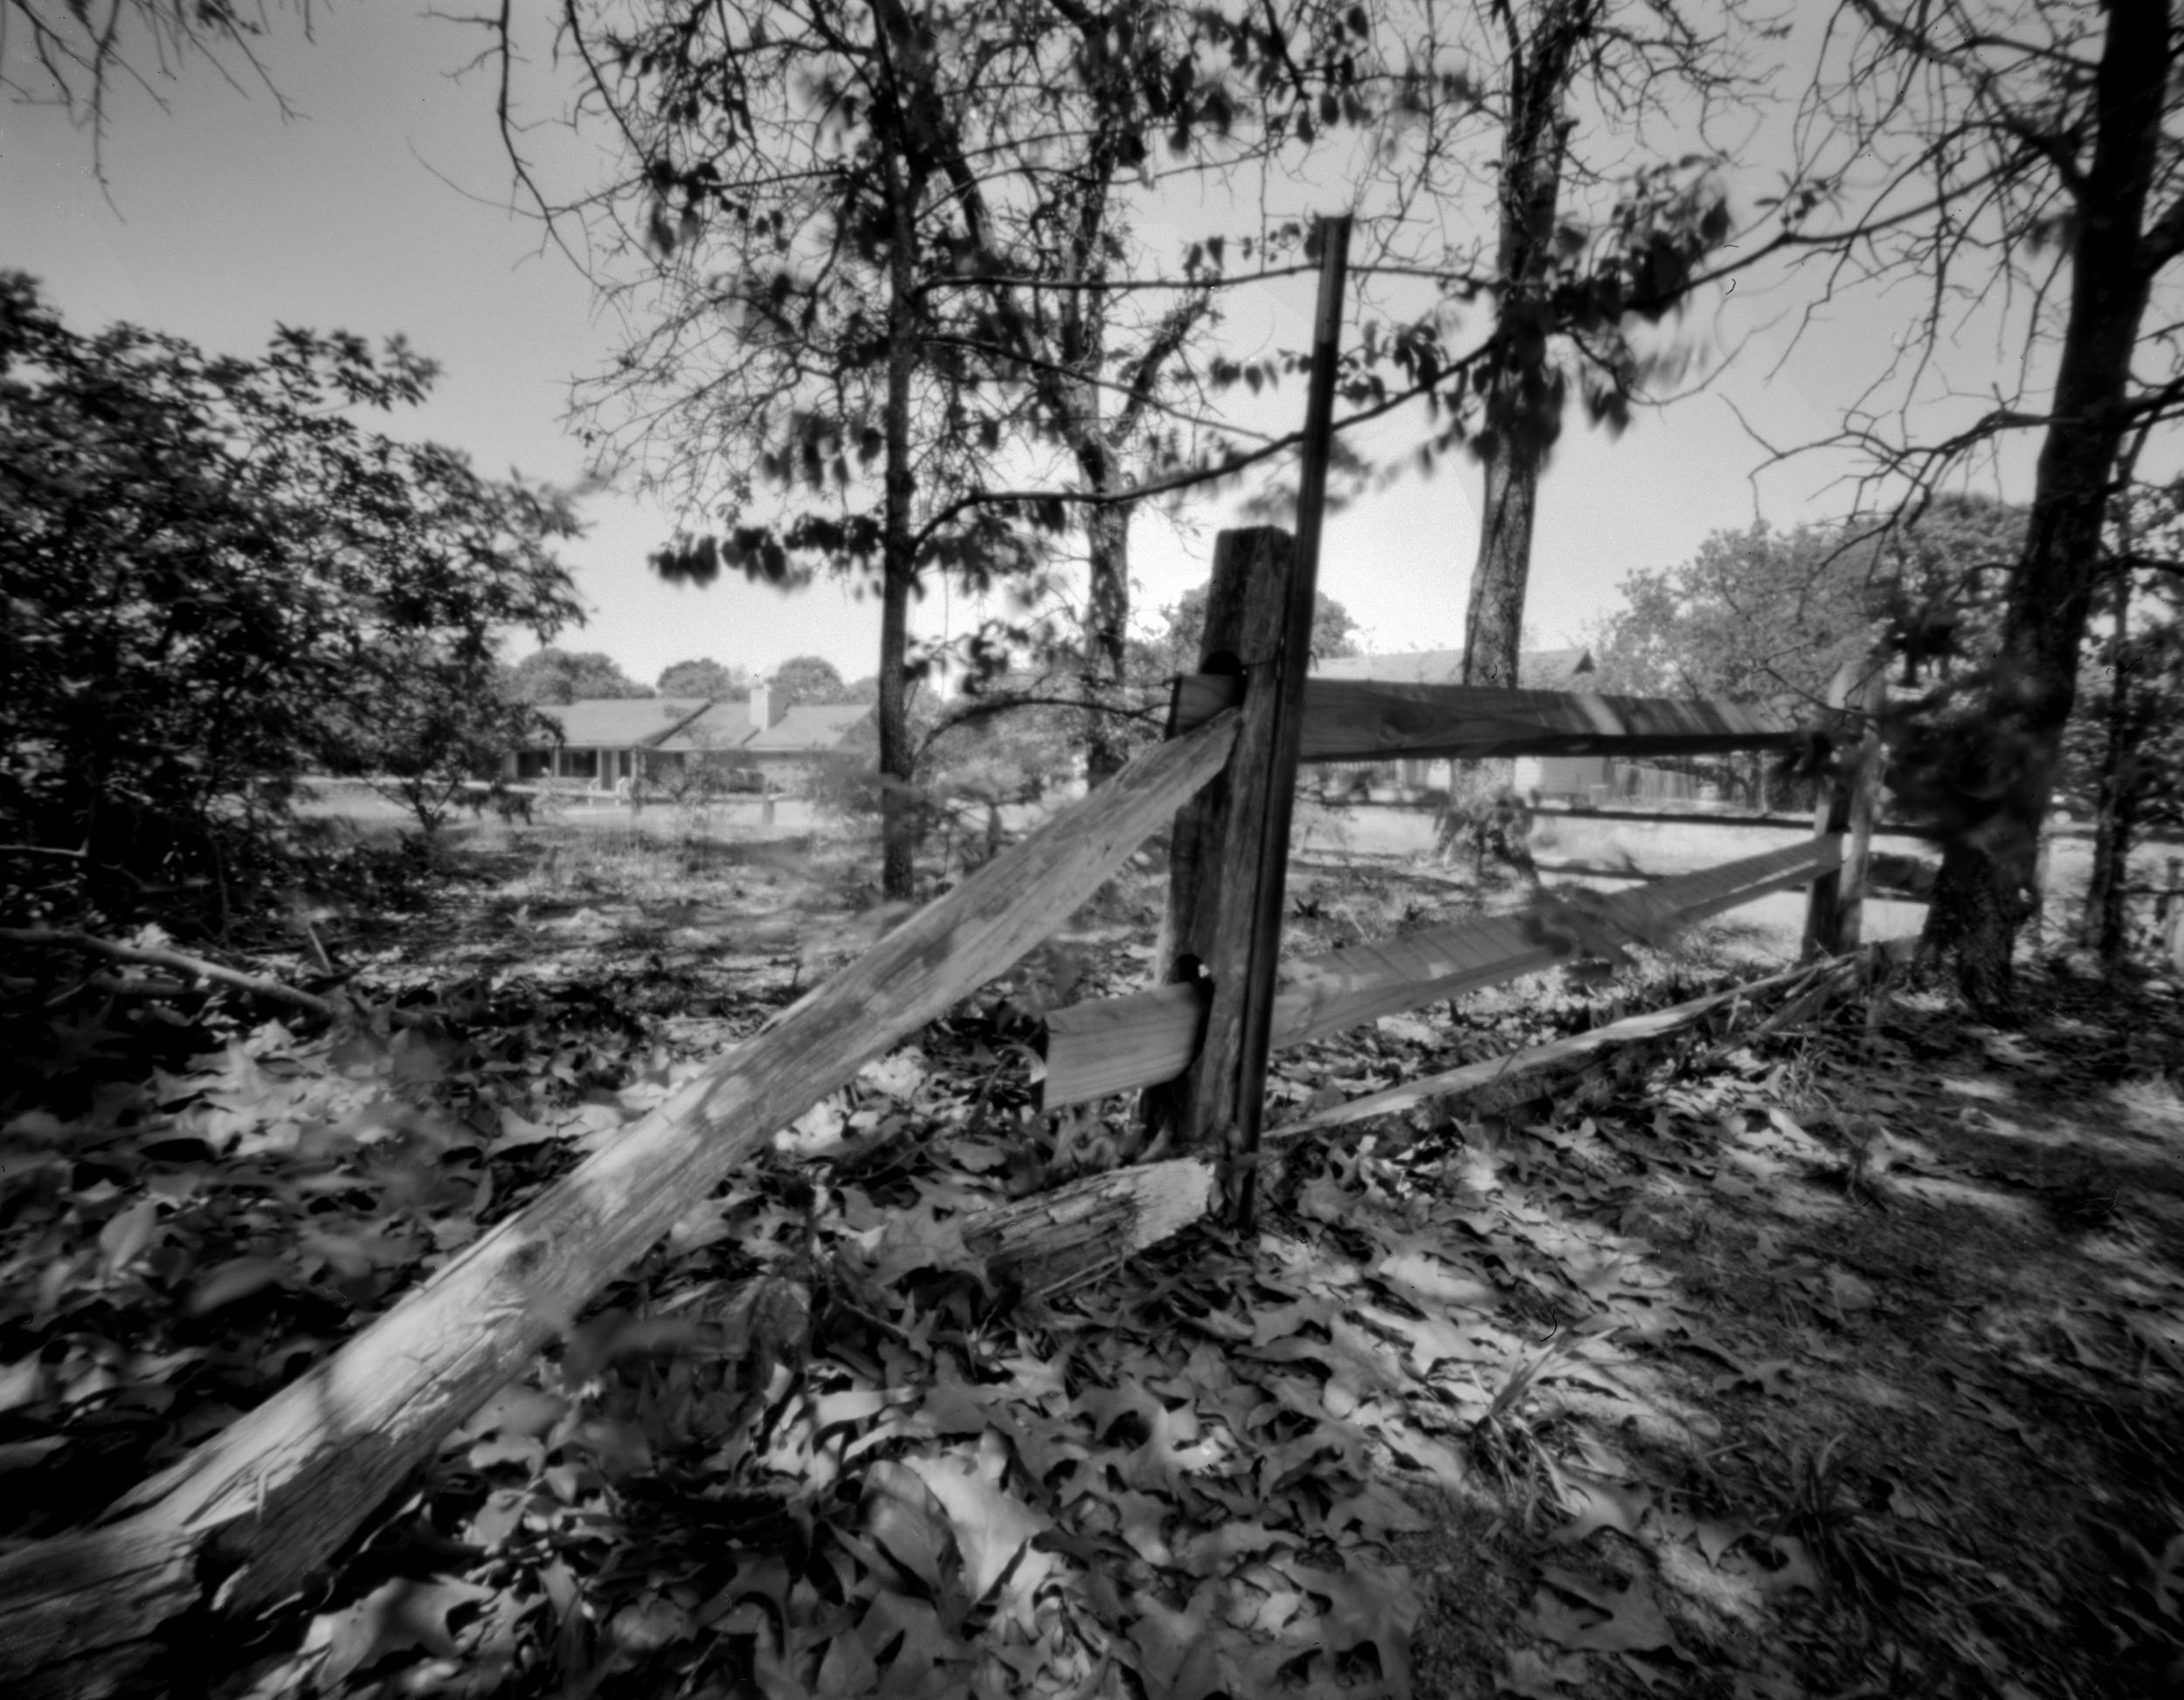 rail fence | Delta 100 , 4x5 lensless camera co